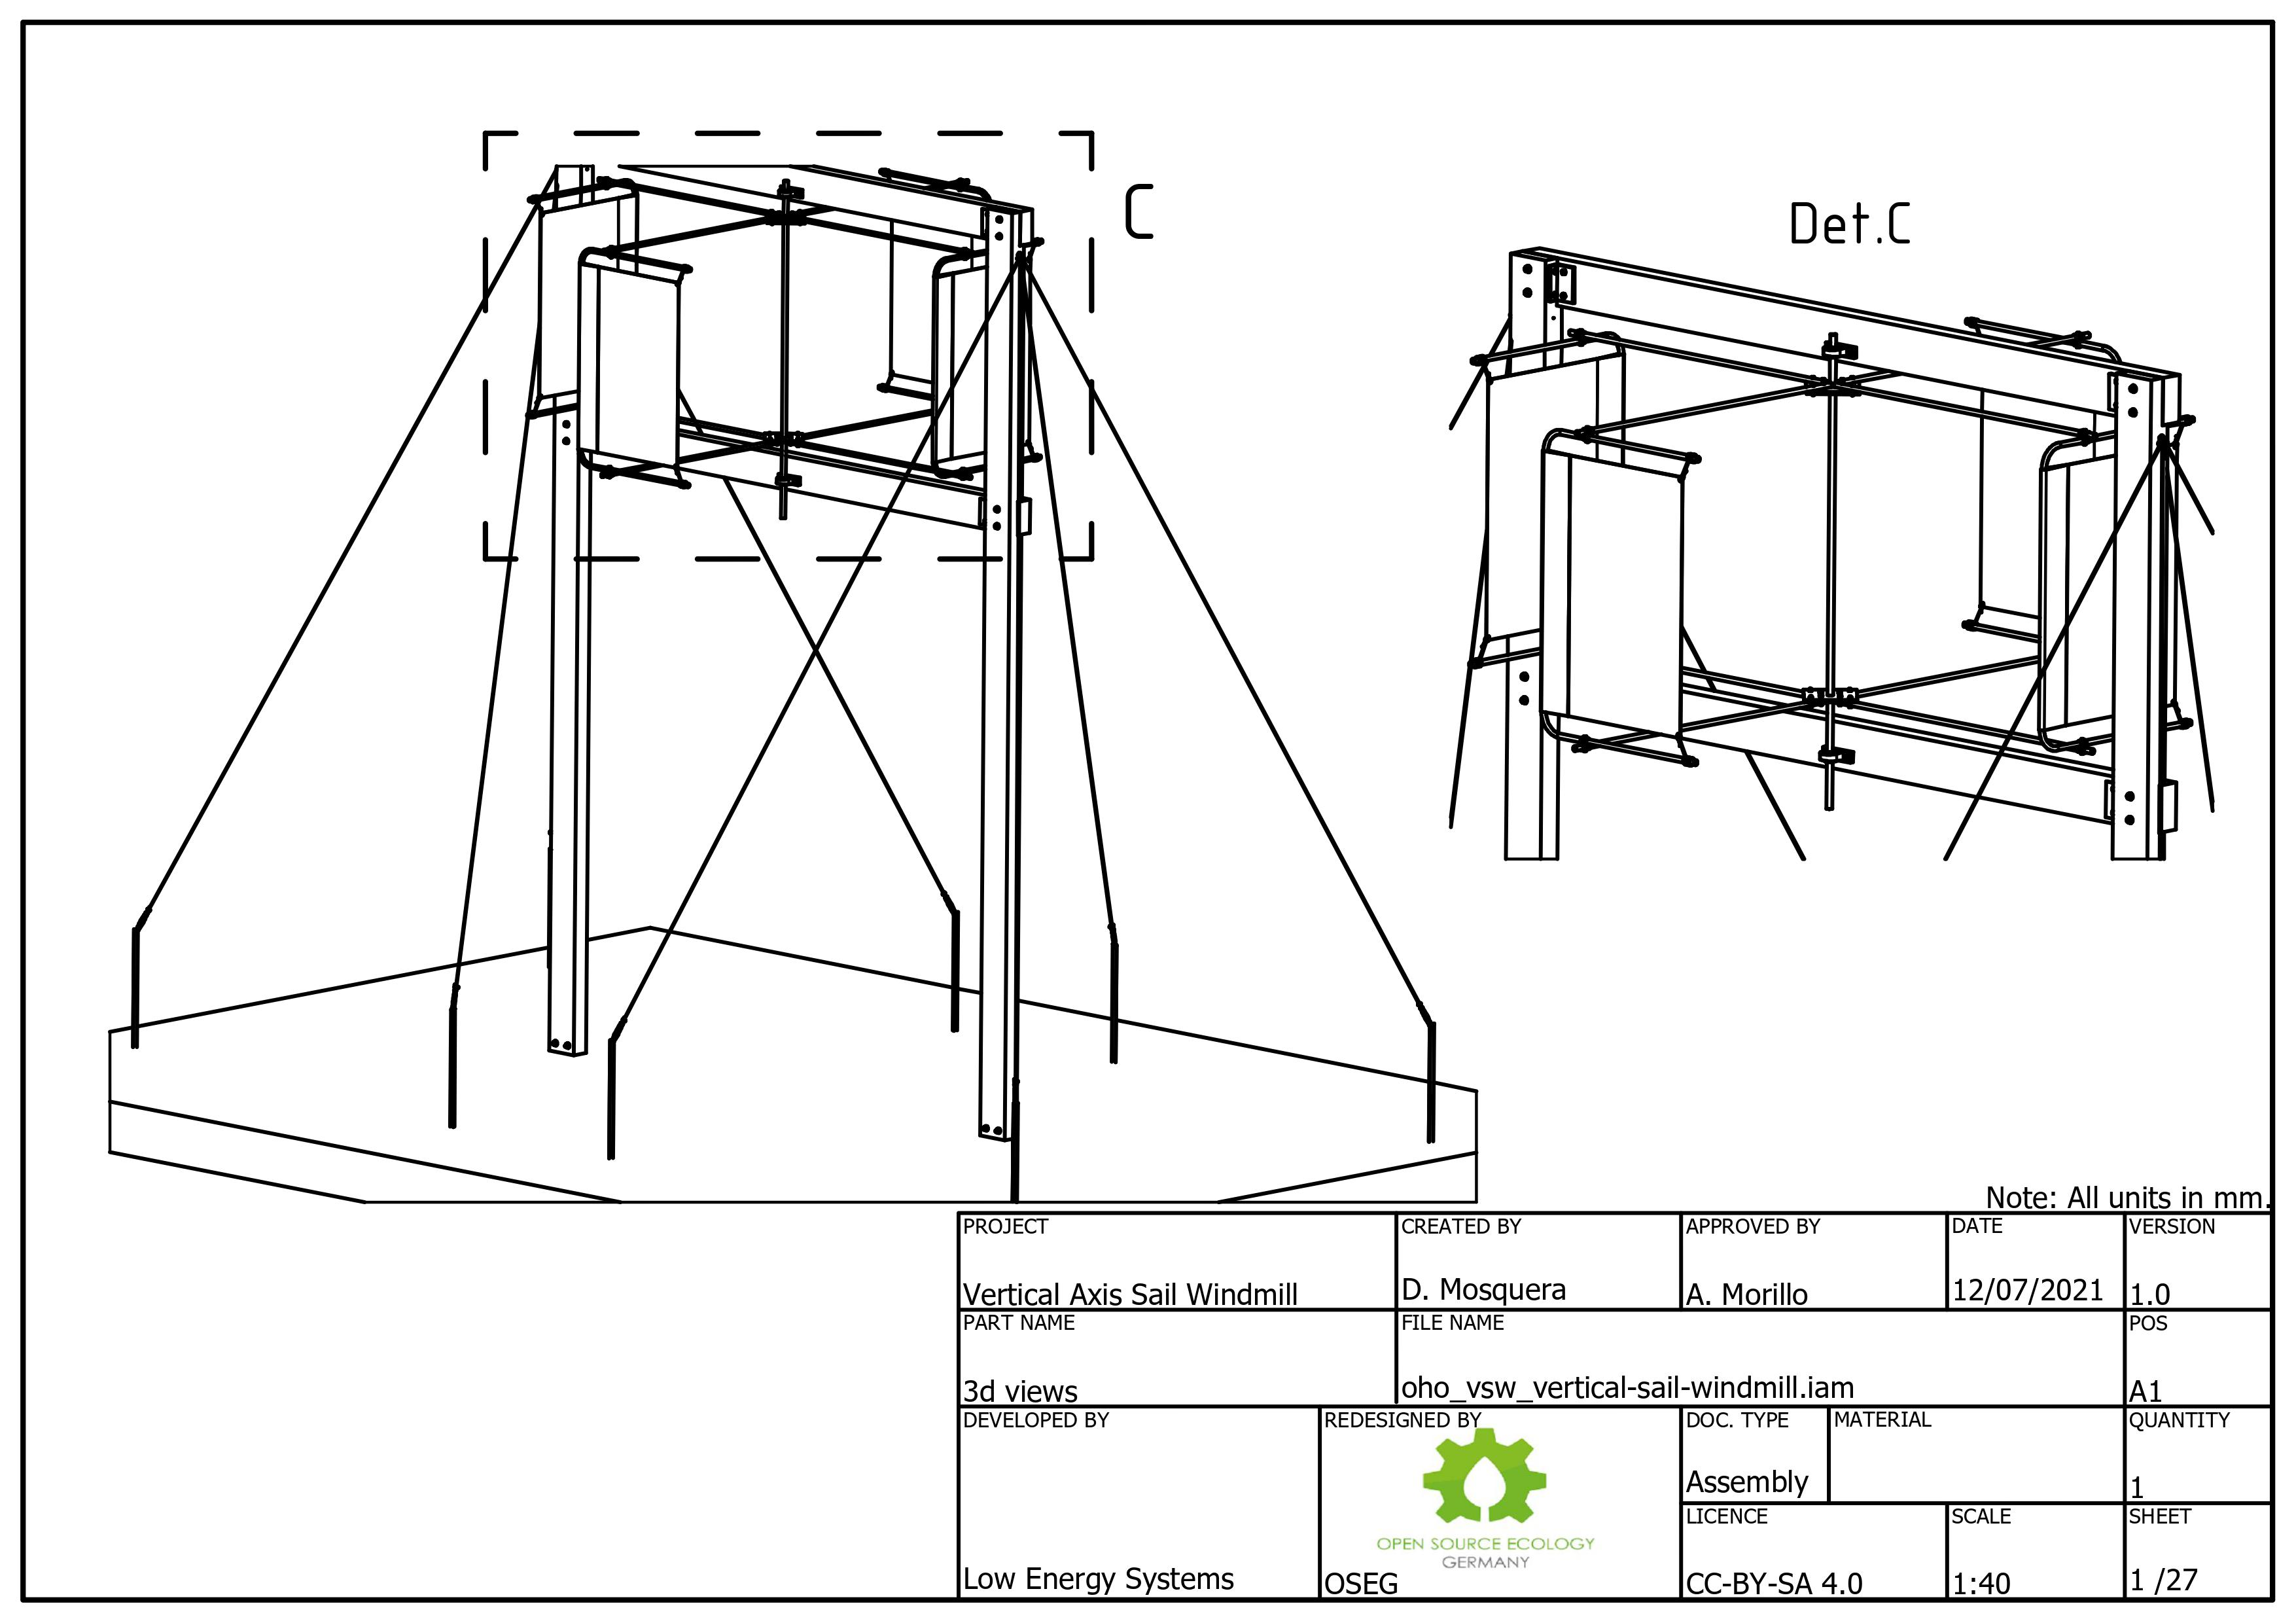 Les vsw vertical-axis-sail-windmill 0001.jpg